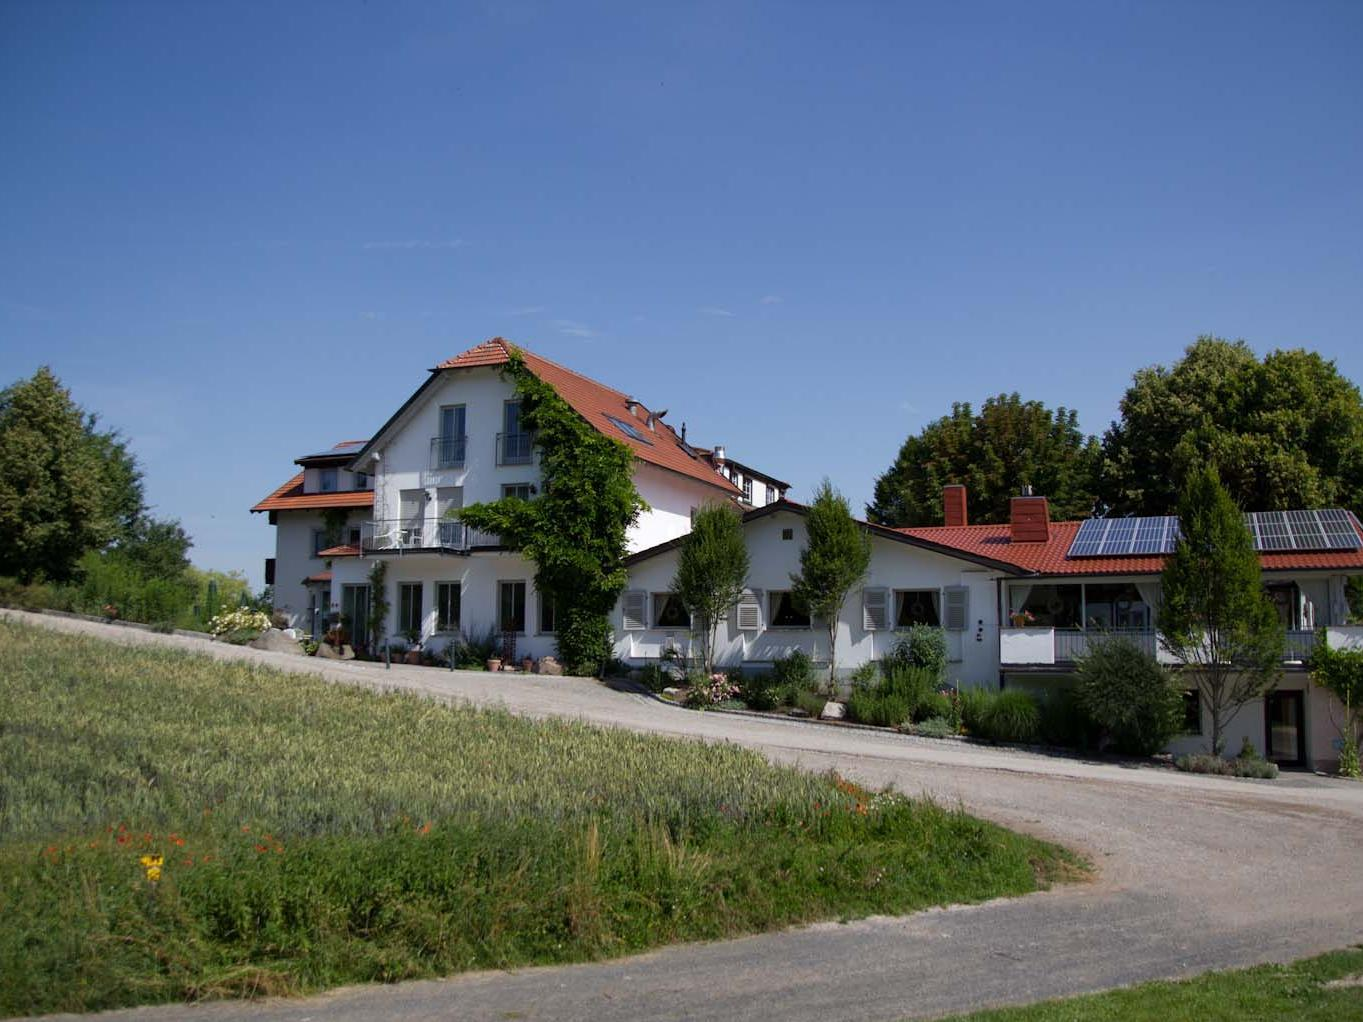 Altes Kurhaus Hotel - Bamberg